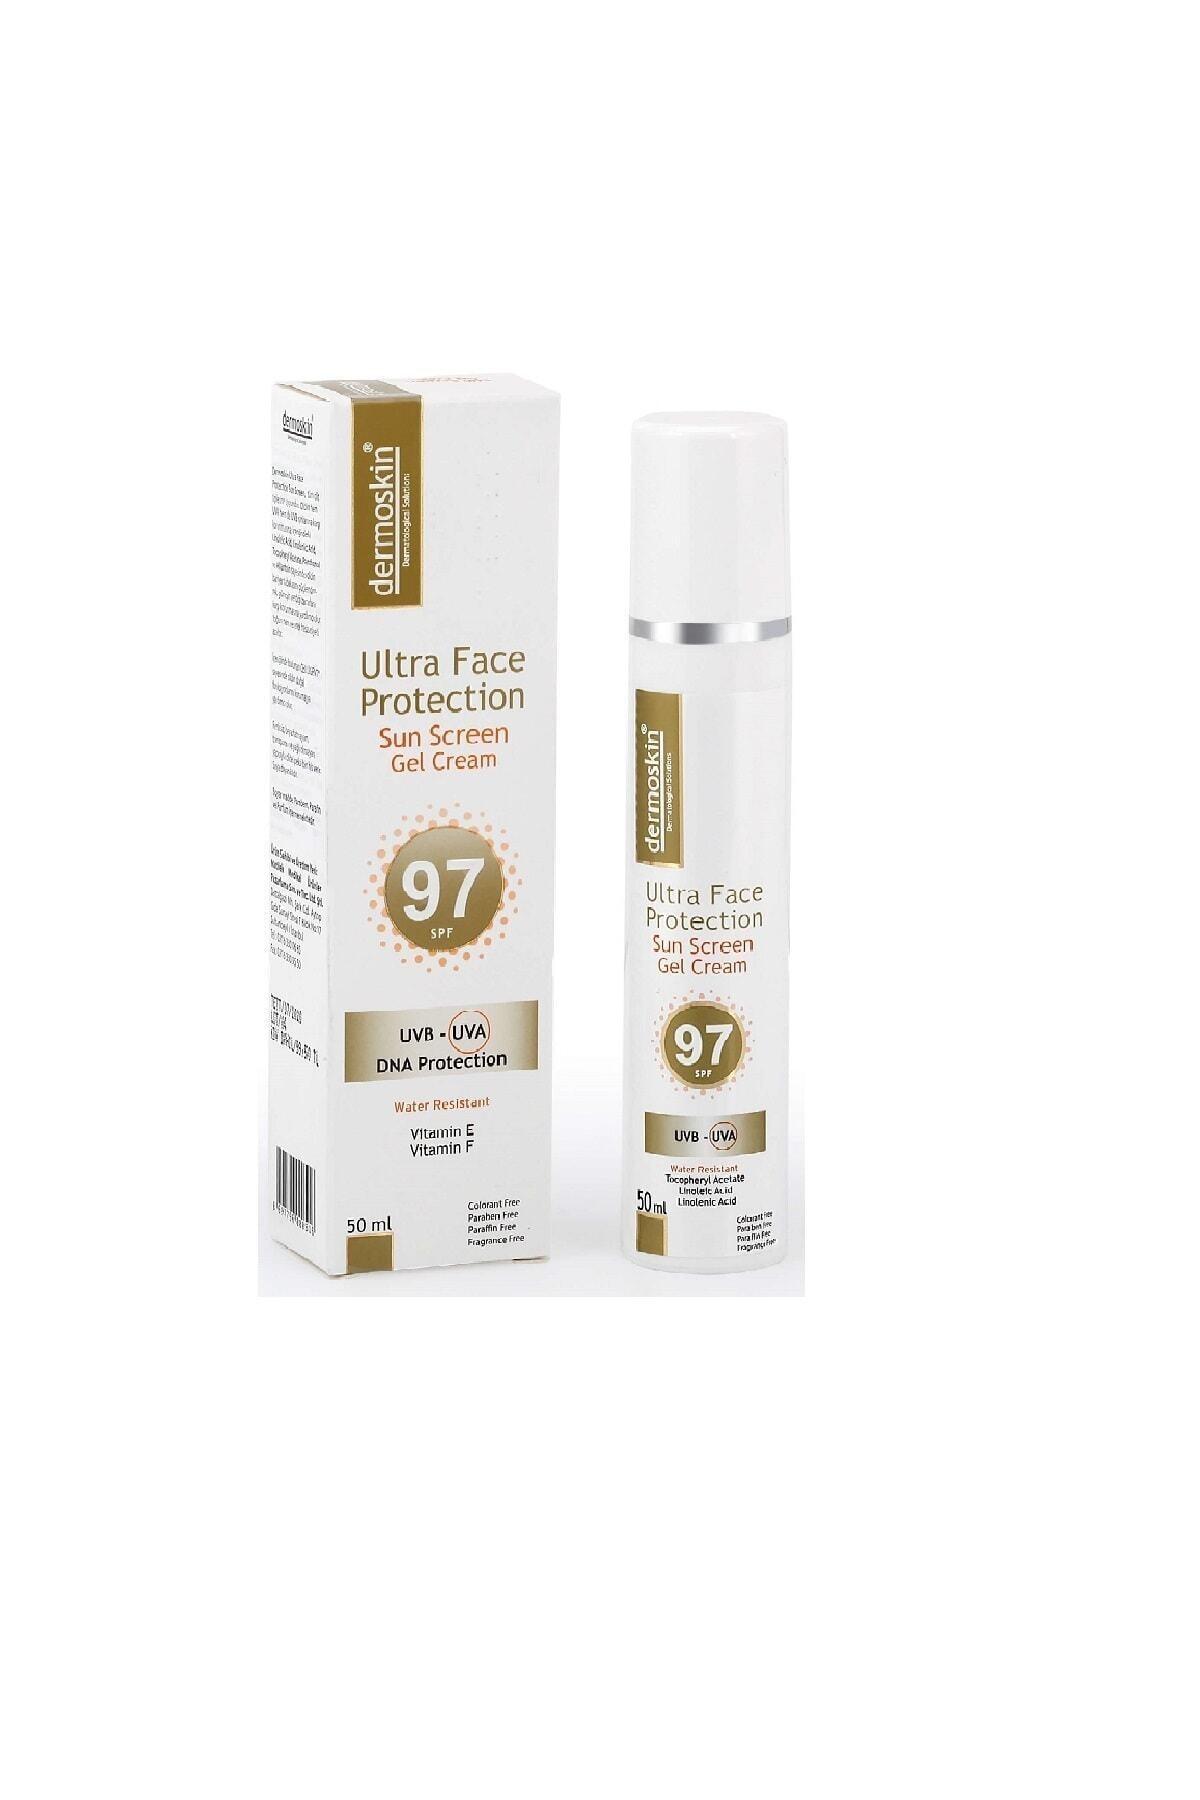 Dermoskin Ultra Face Protection Sun Screen Spf97 50ml 1